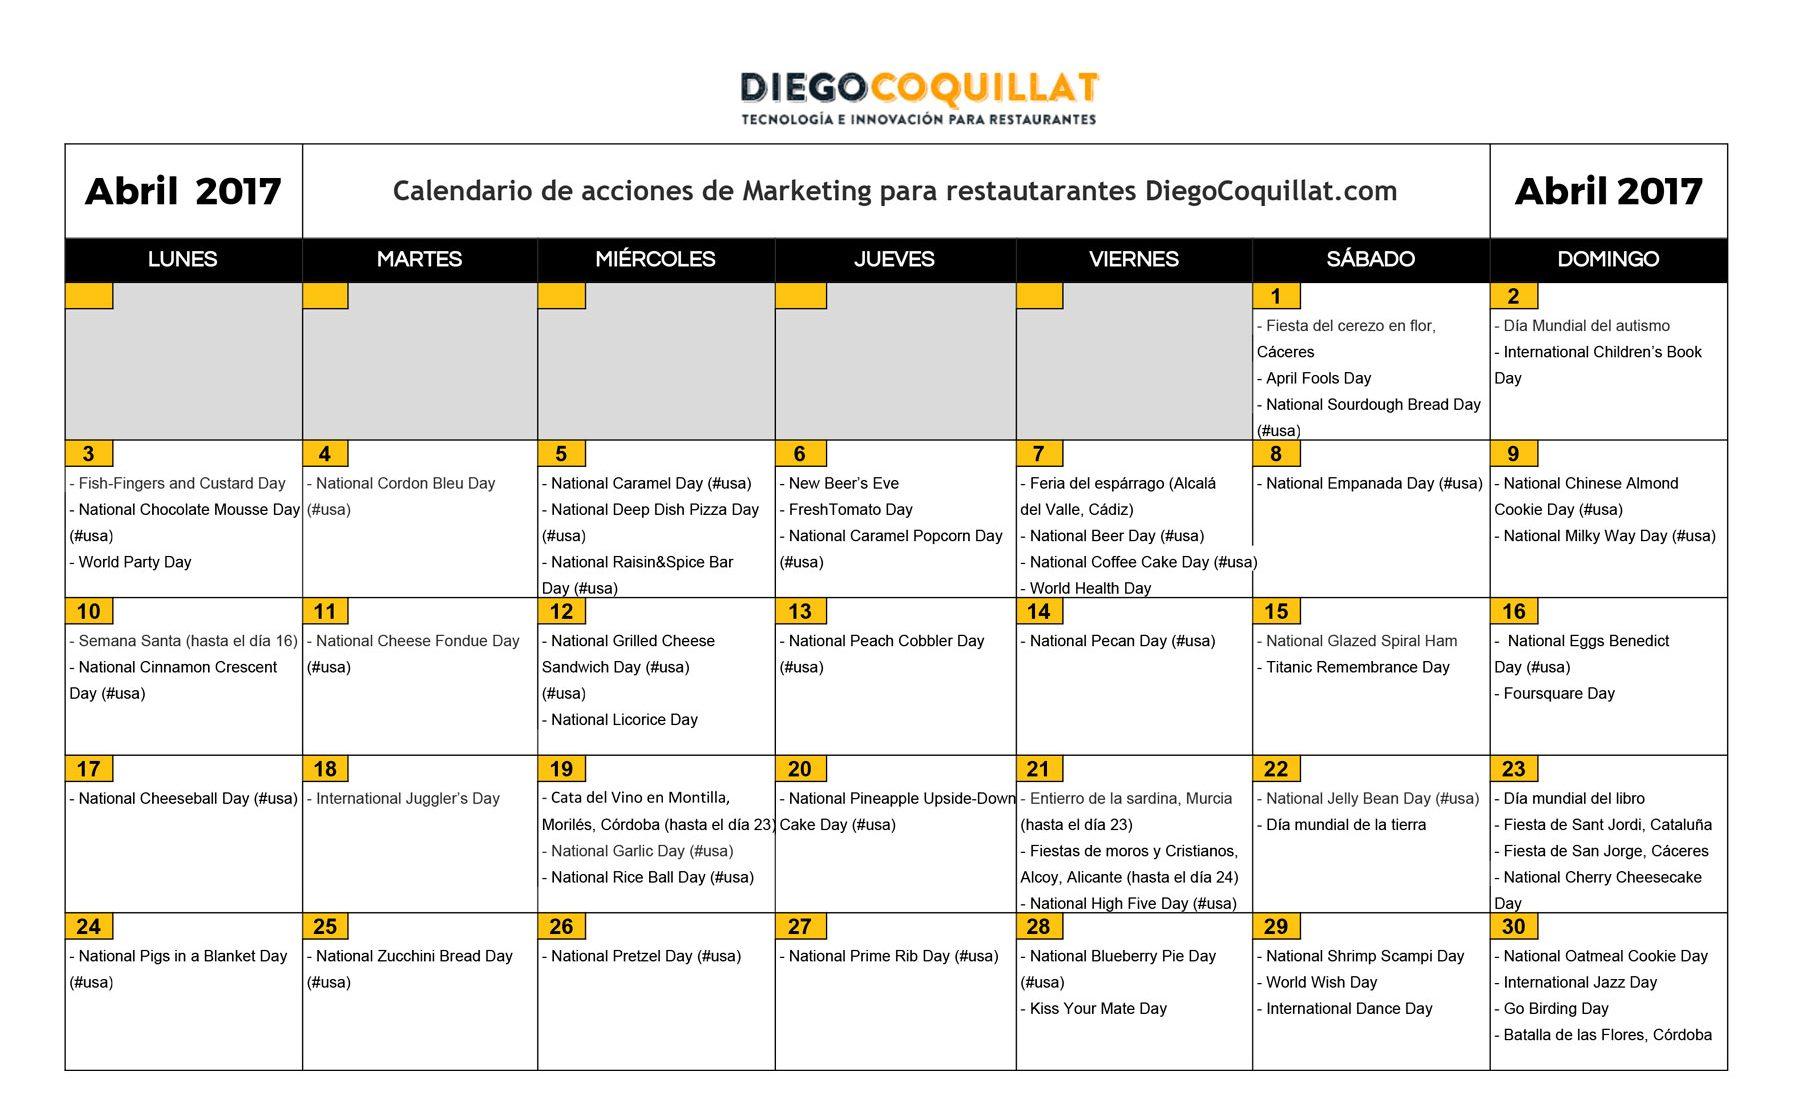 April 2017: marketing activities calendar for restaurants